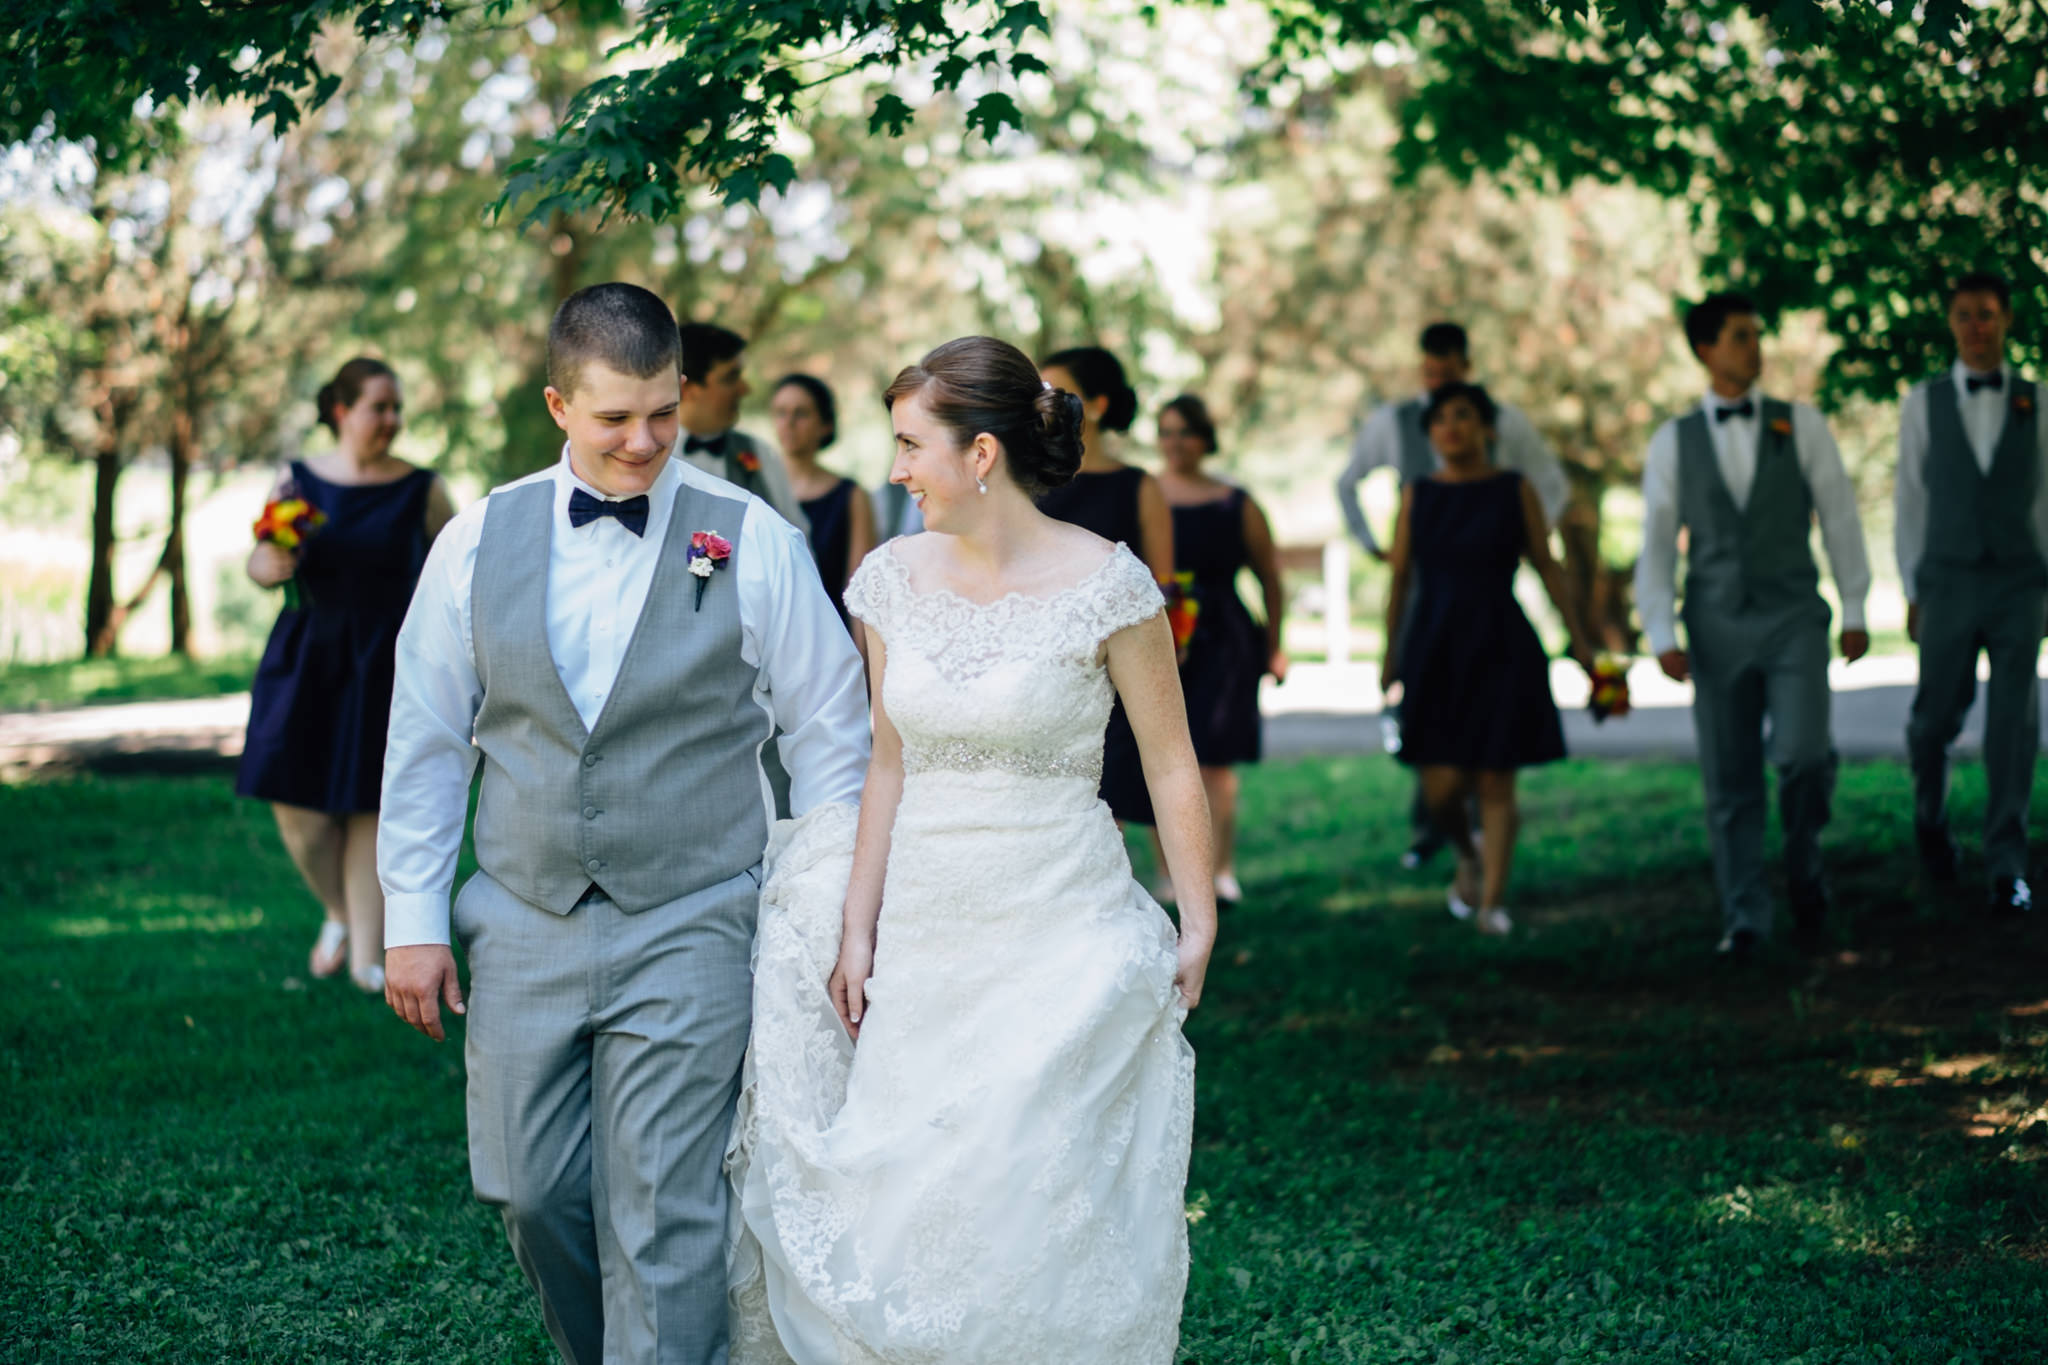 Jennifer&Drew_Wedding_Blog_020.jpg